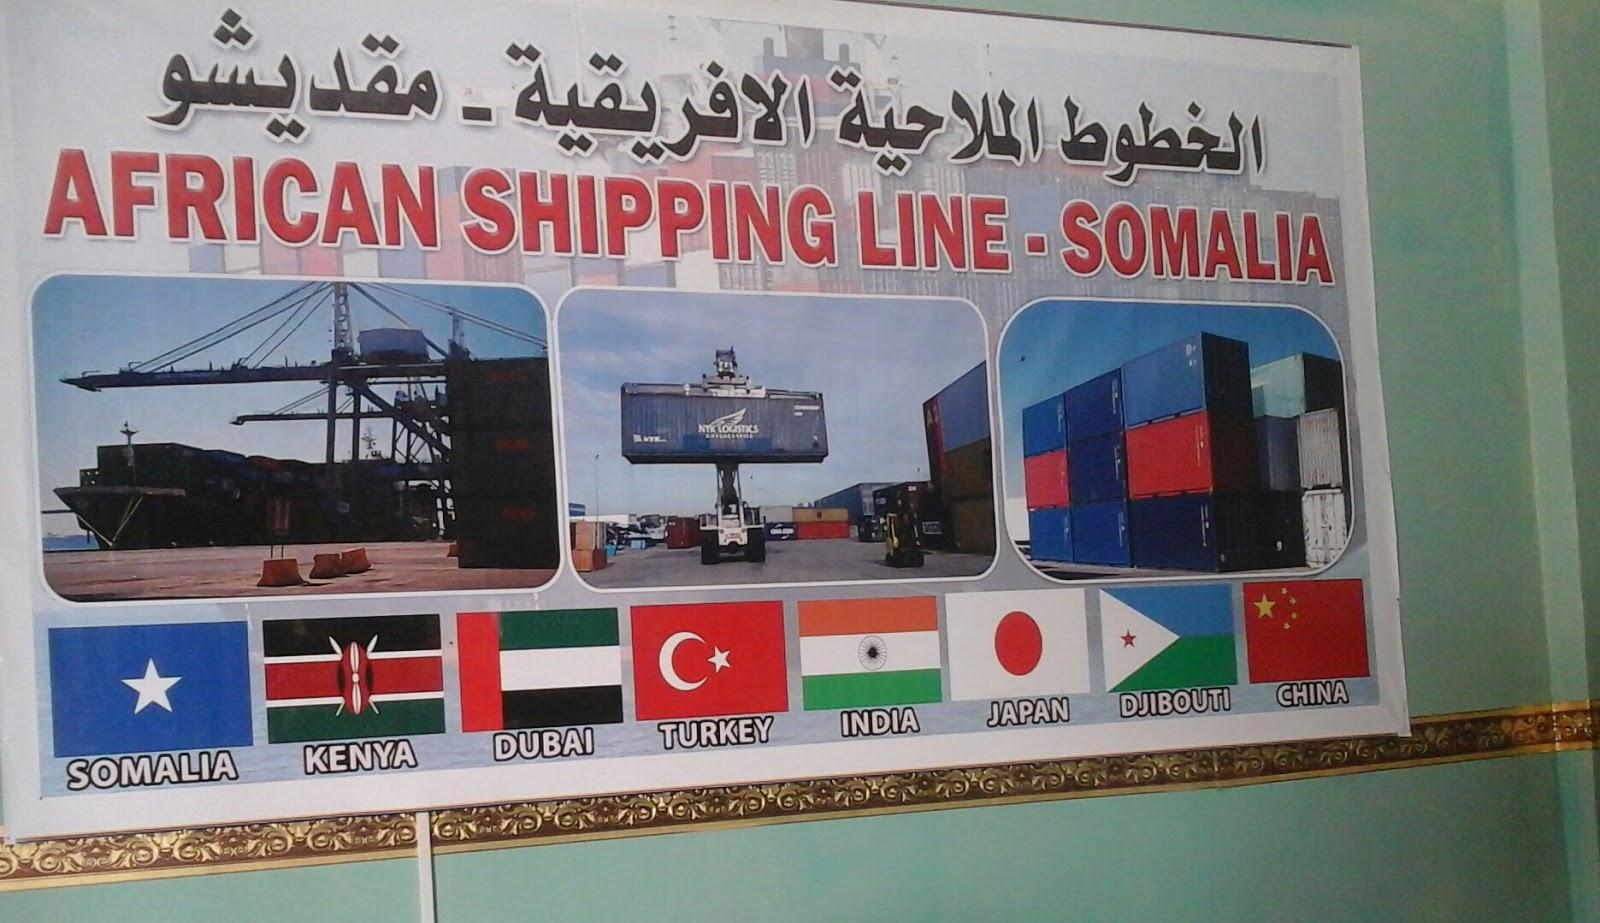 AFRICAN SHIPPING LINE - ASLINE: AFRICA, CHINA, DUBAI, TURKEY